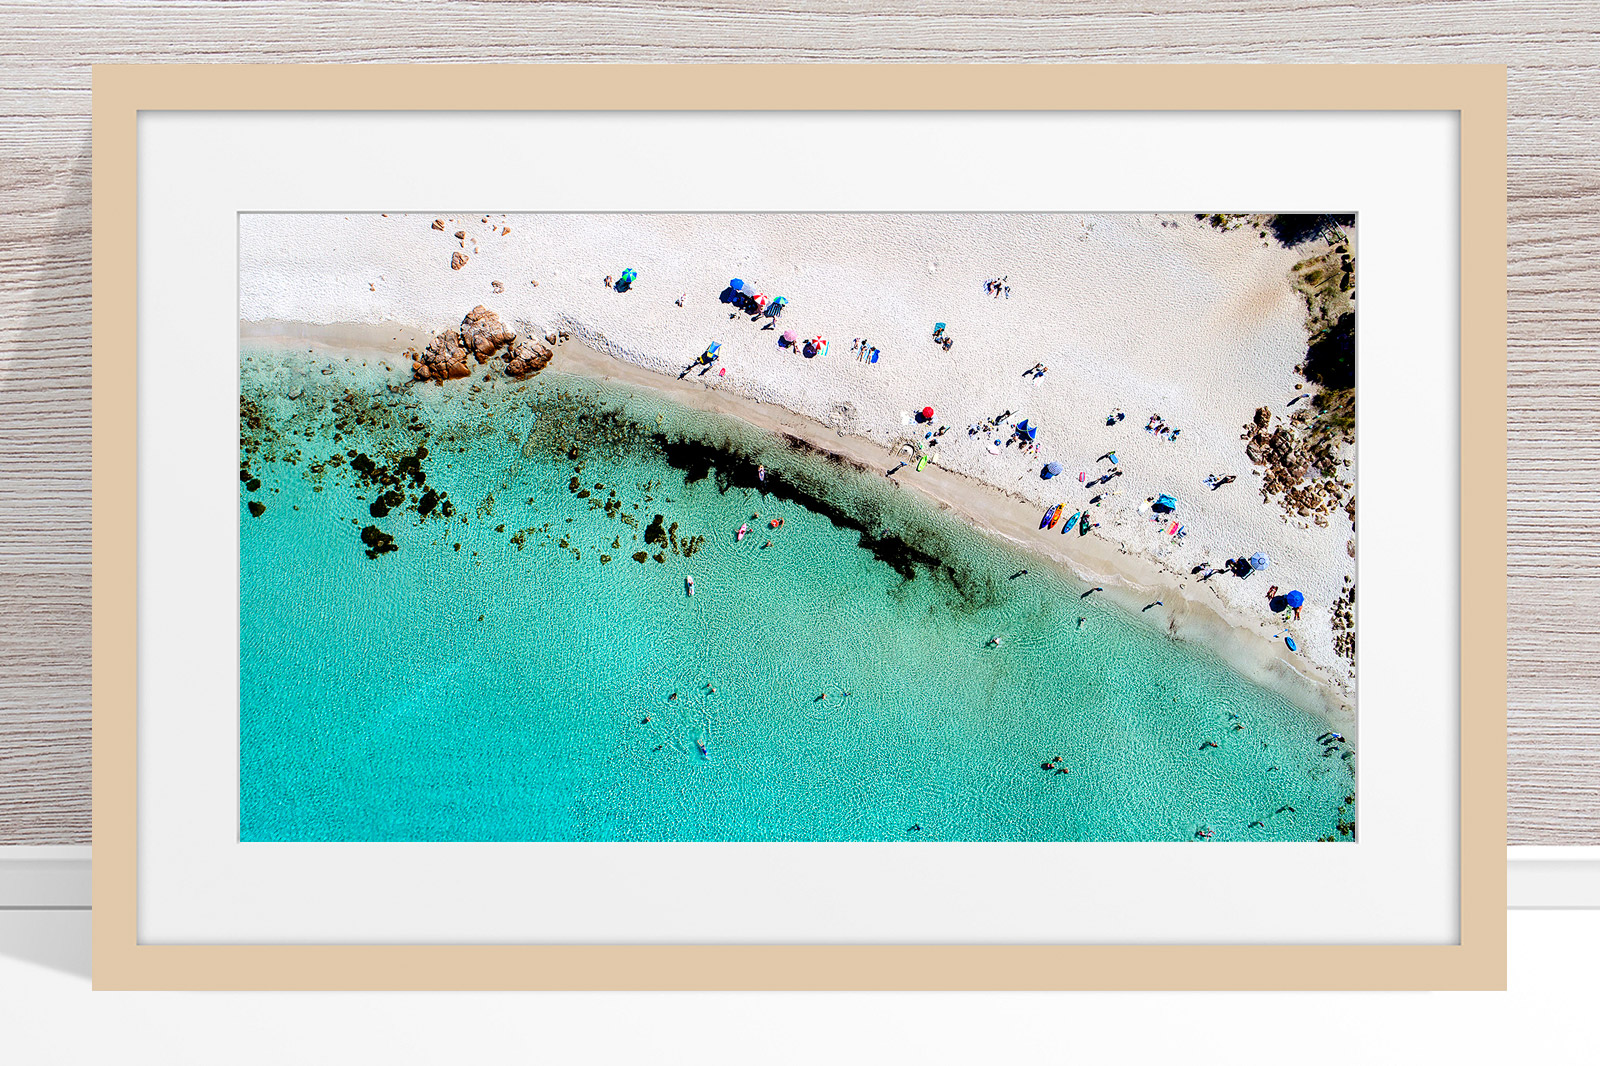 015 - Jason Mazur - 'Castle Bay Beach, Dunsborough' Light Frame